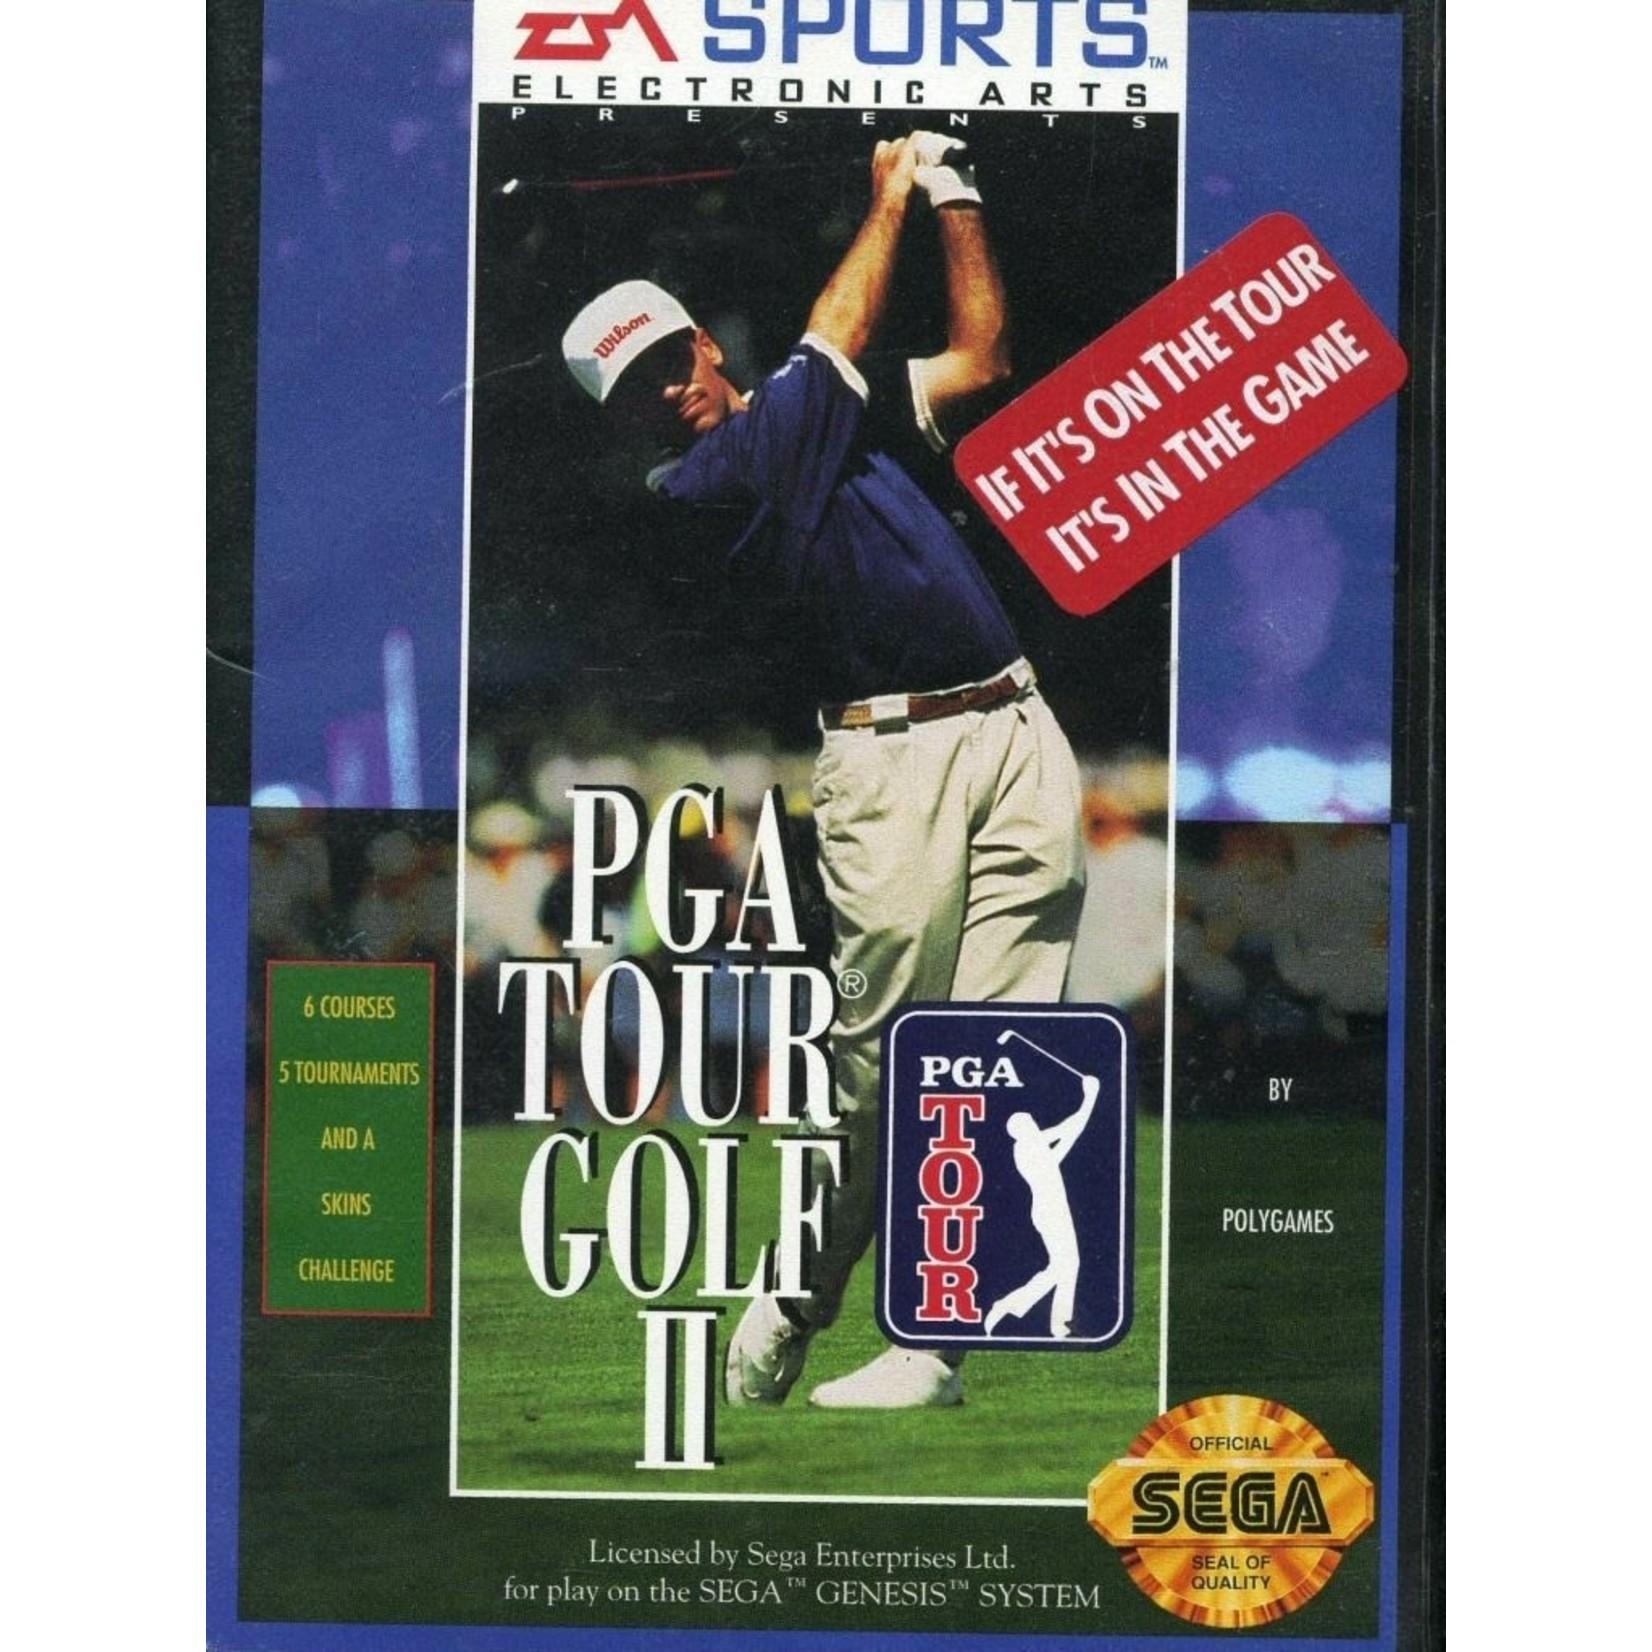 SGU-PGA Tour Golf II (boxed)